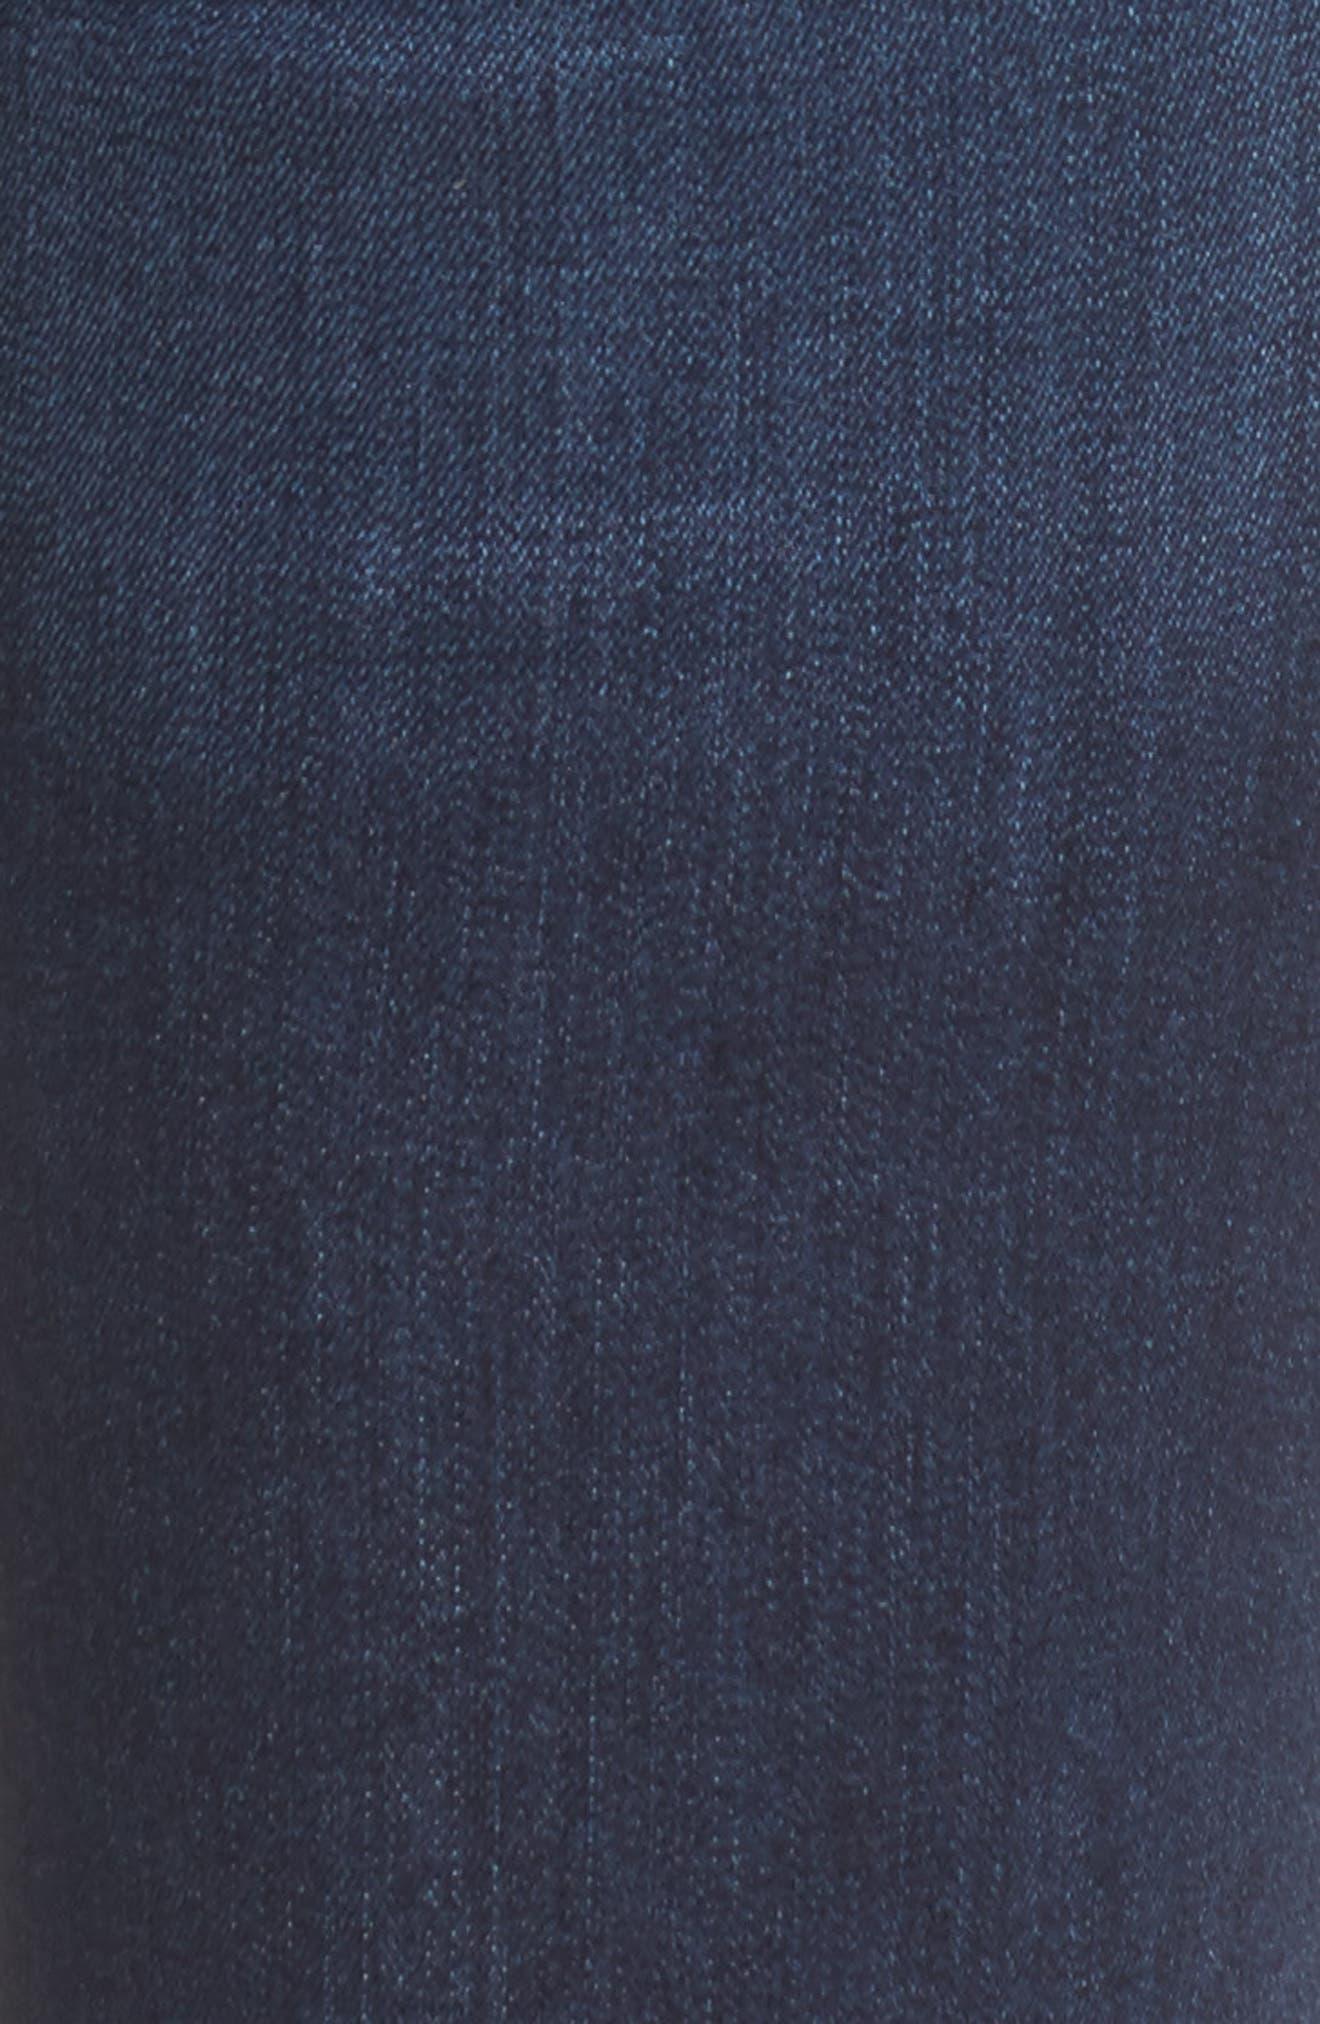 Bombshell High Waist Stretch Skinny Jeans,                             Alternate thumbnail 15, color,